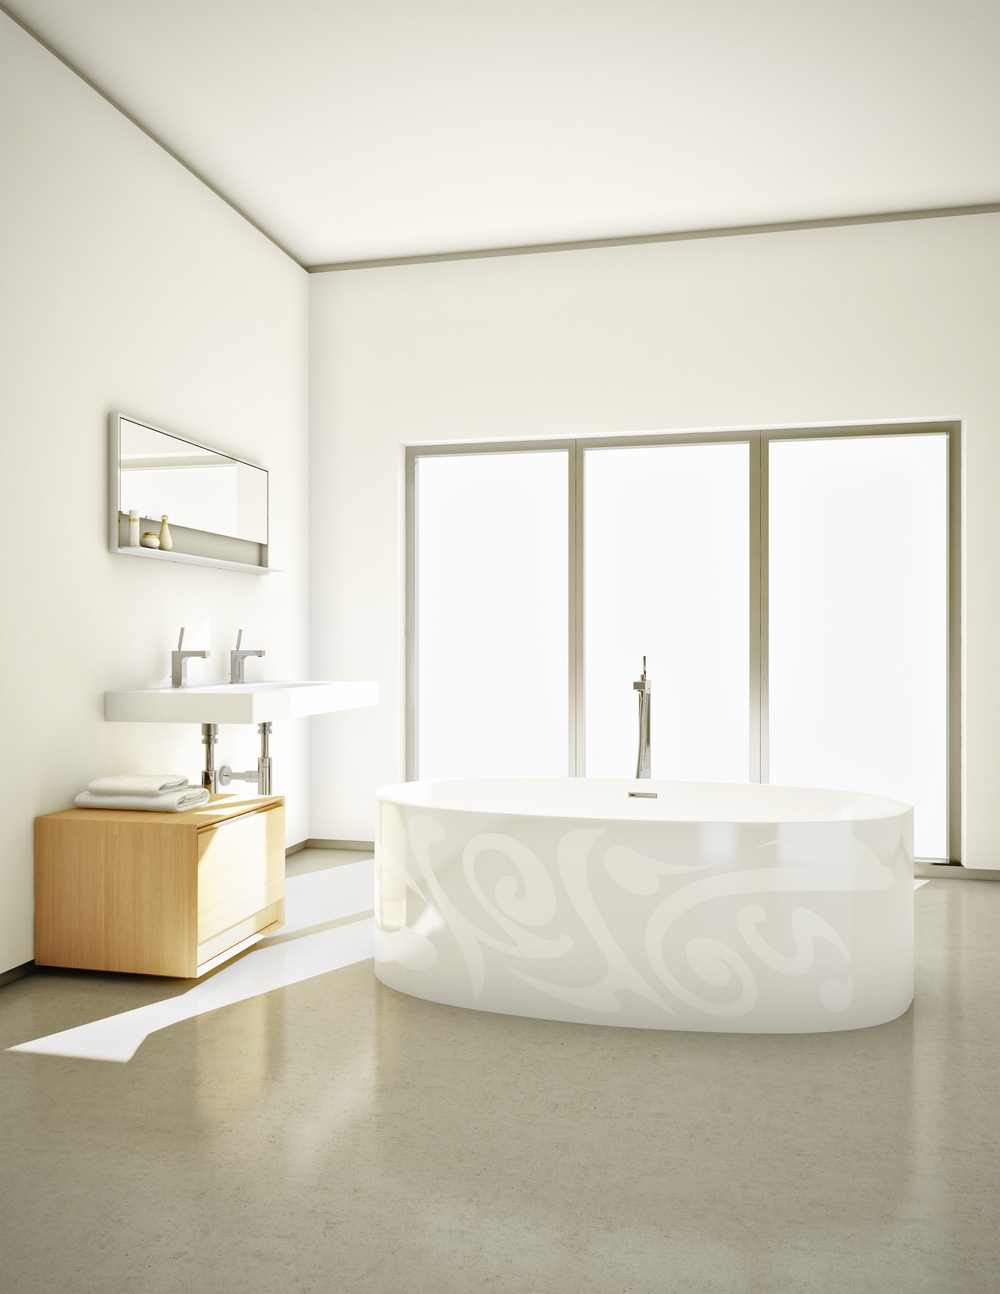 Wetstyle Imagin tub.jpg